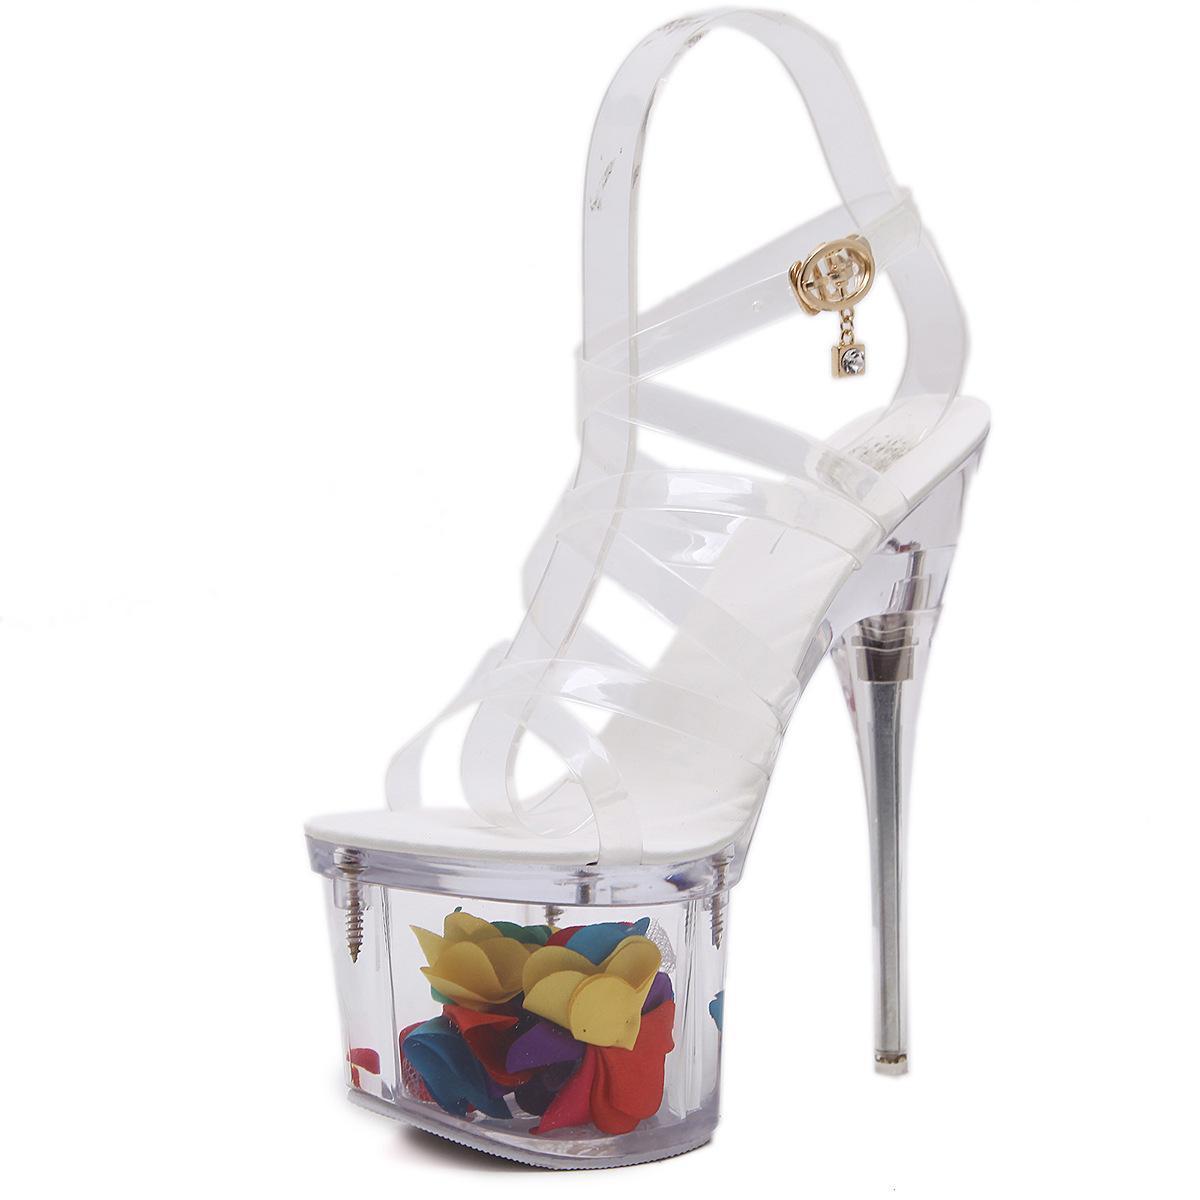 8f50b3fa9f74 Cheap Glitter Platform Sandal Heels Gold Best Elegant Platform Sandals